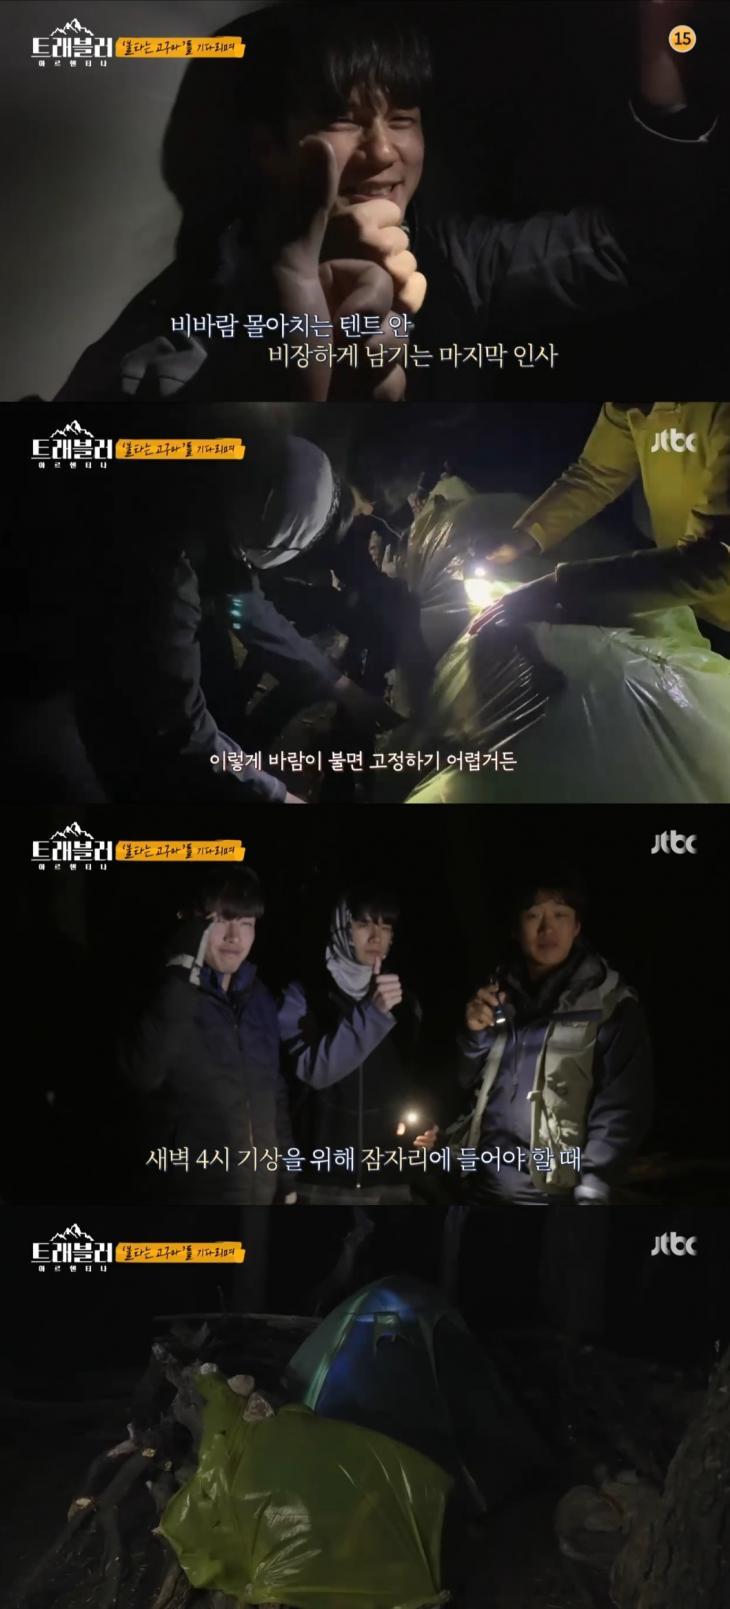 JTBC 예능프로그램 '트래블러'